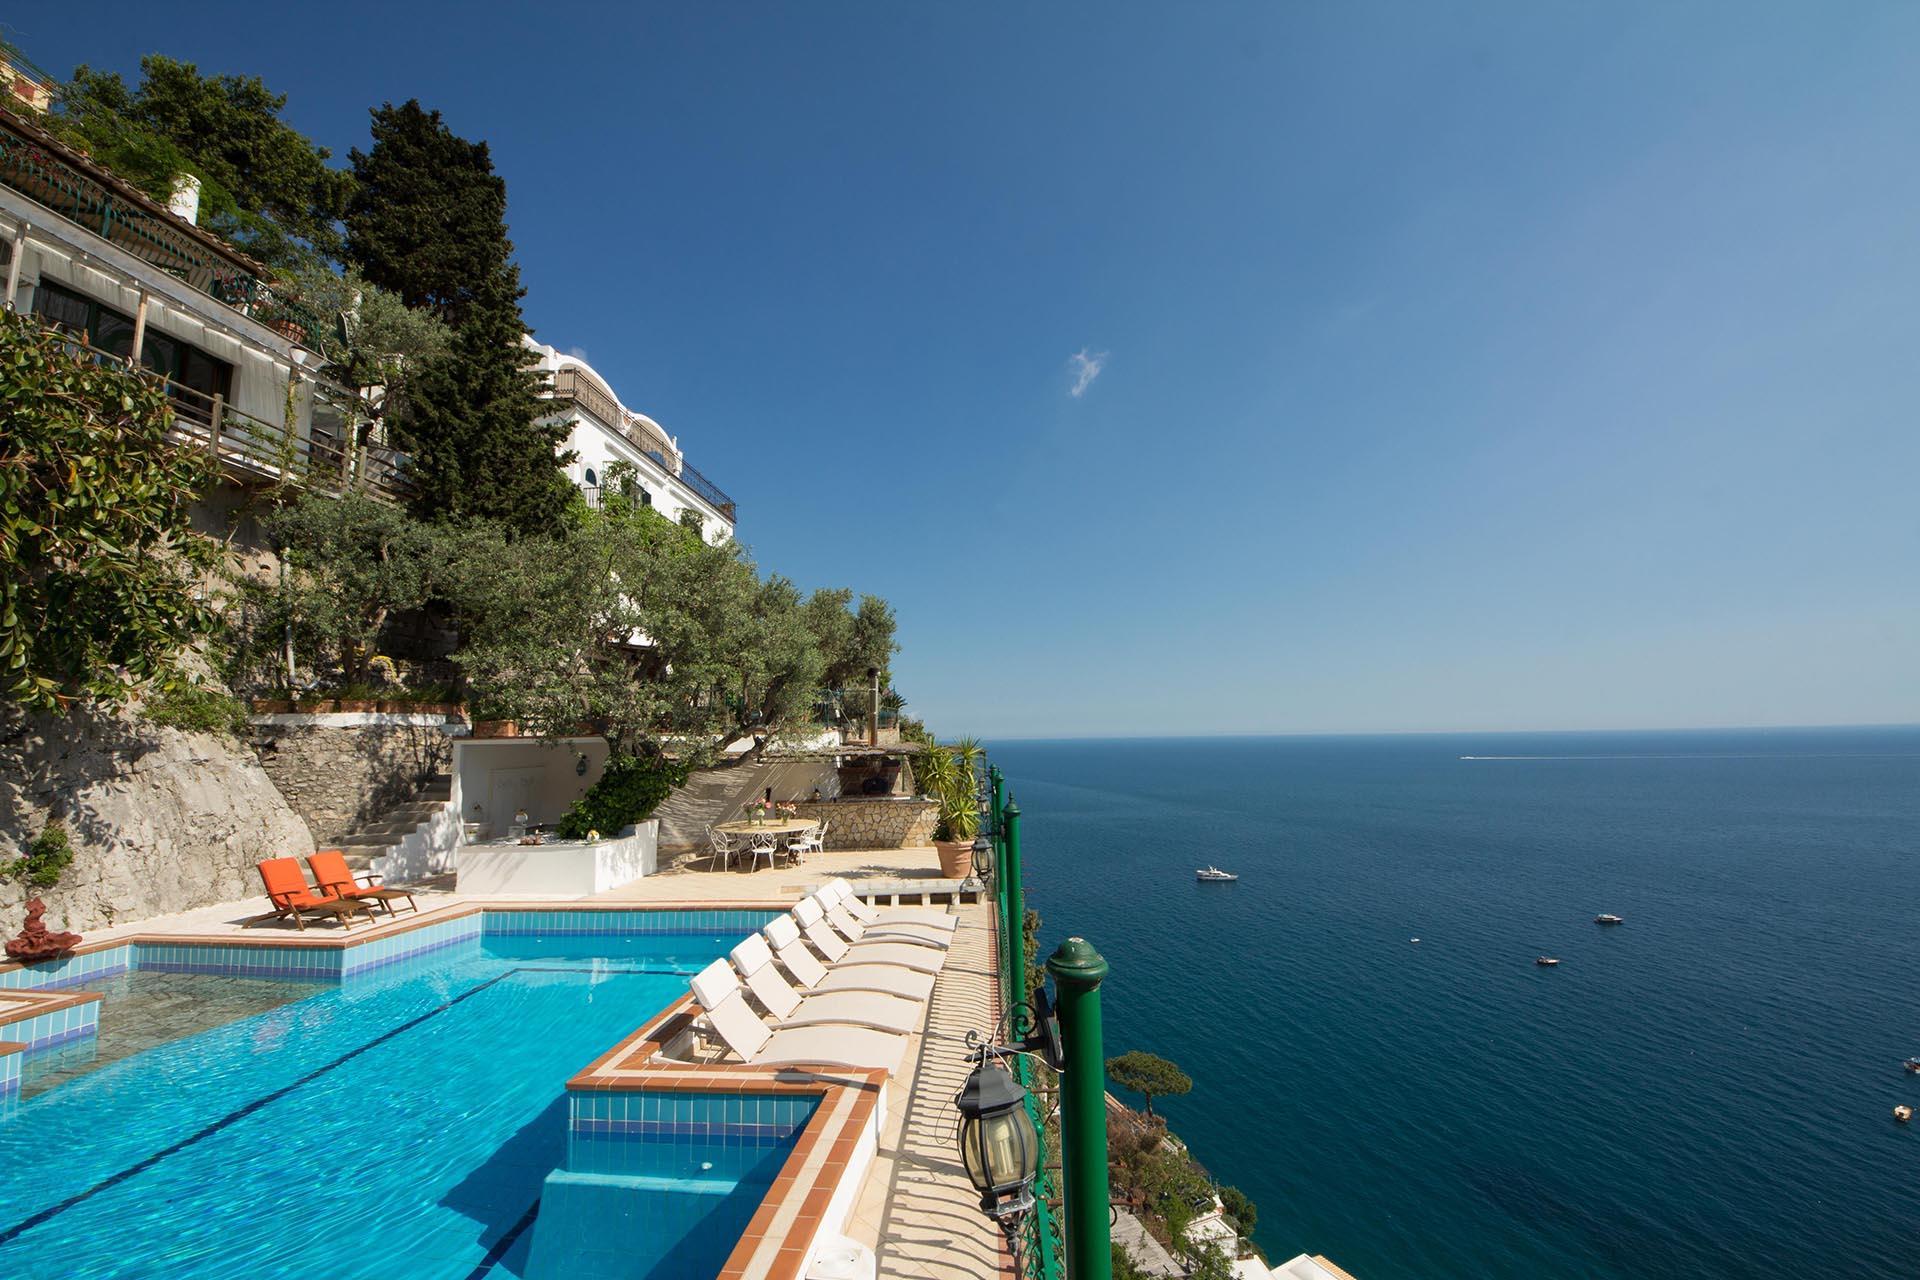 Pool and Sea View , La Scogliera, Positano, Amalfi Coast Campania.